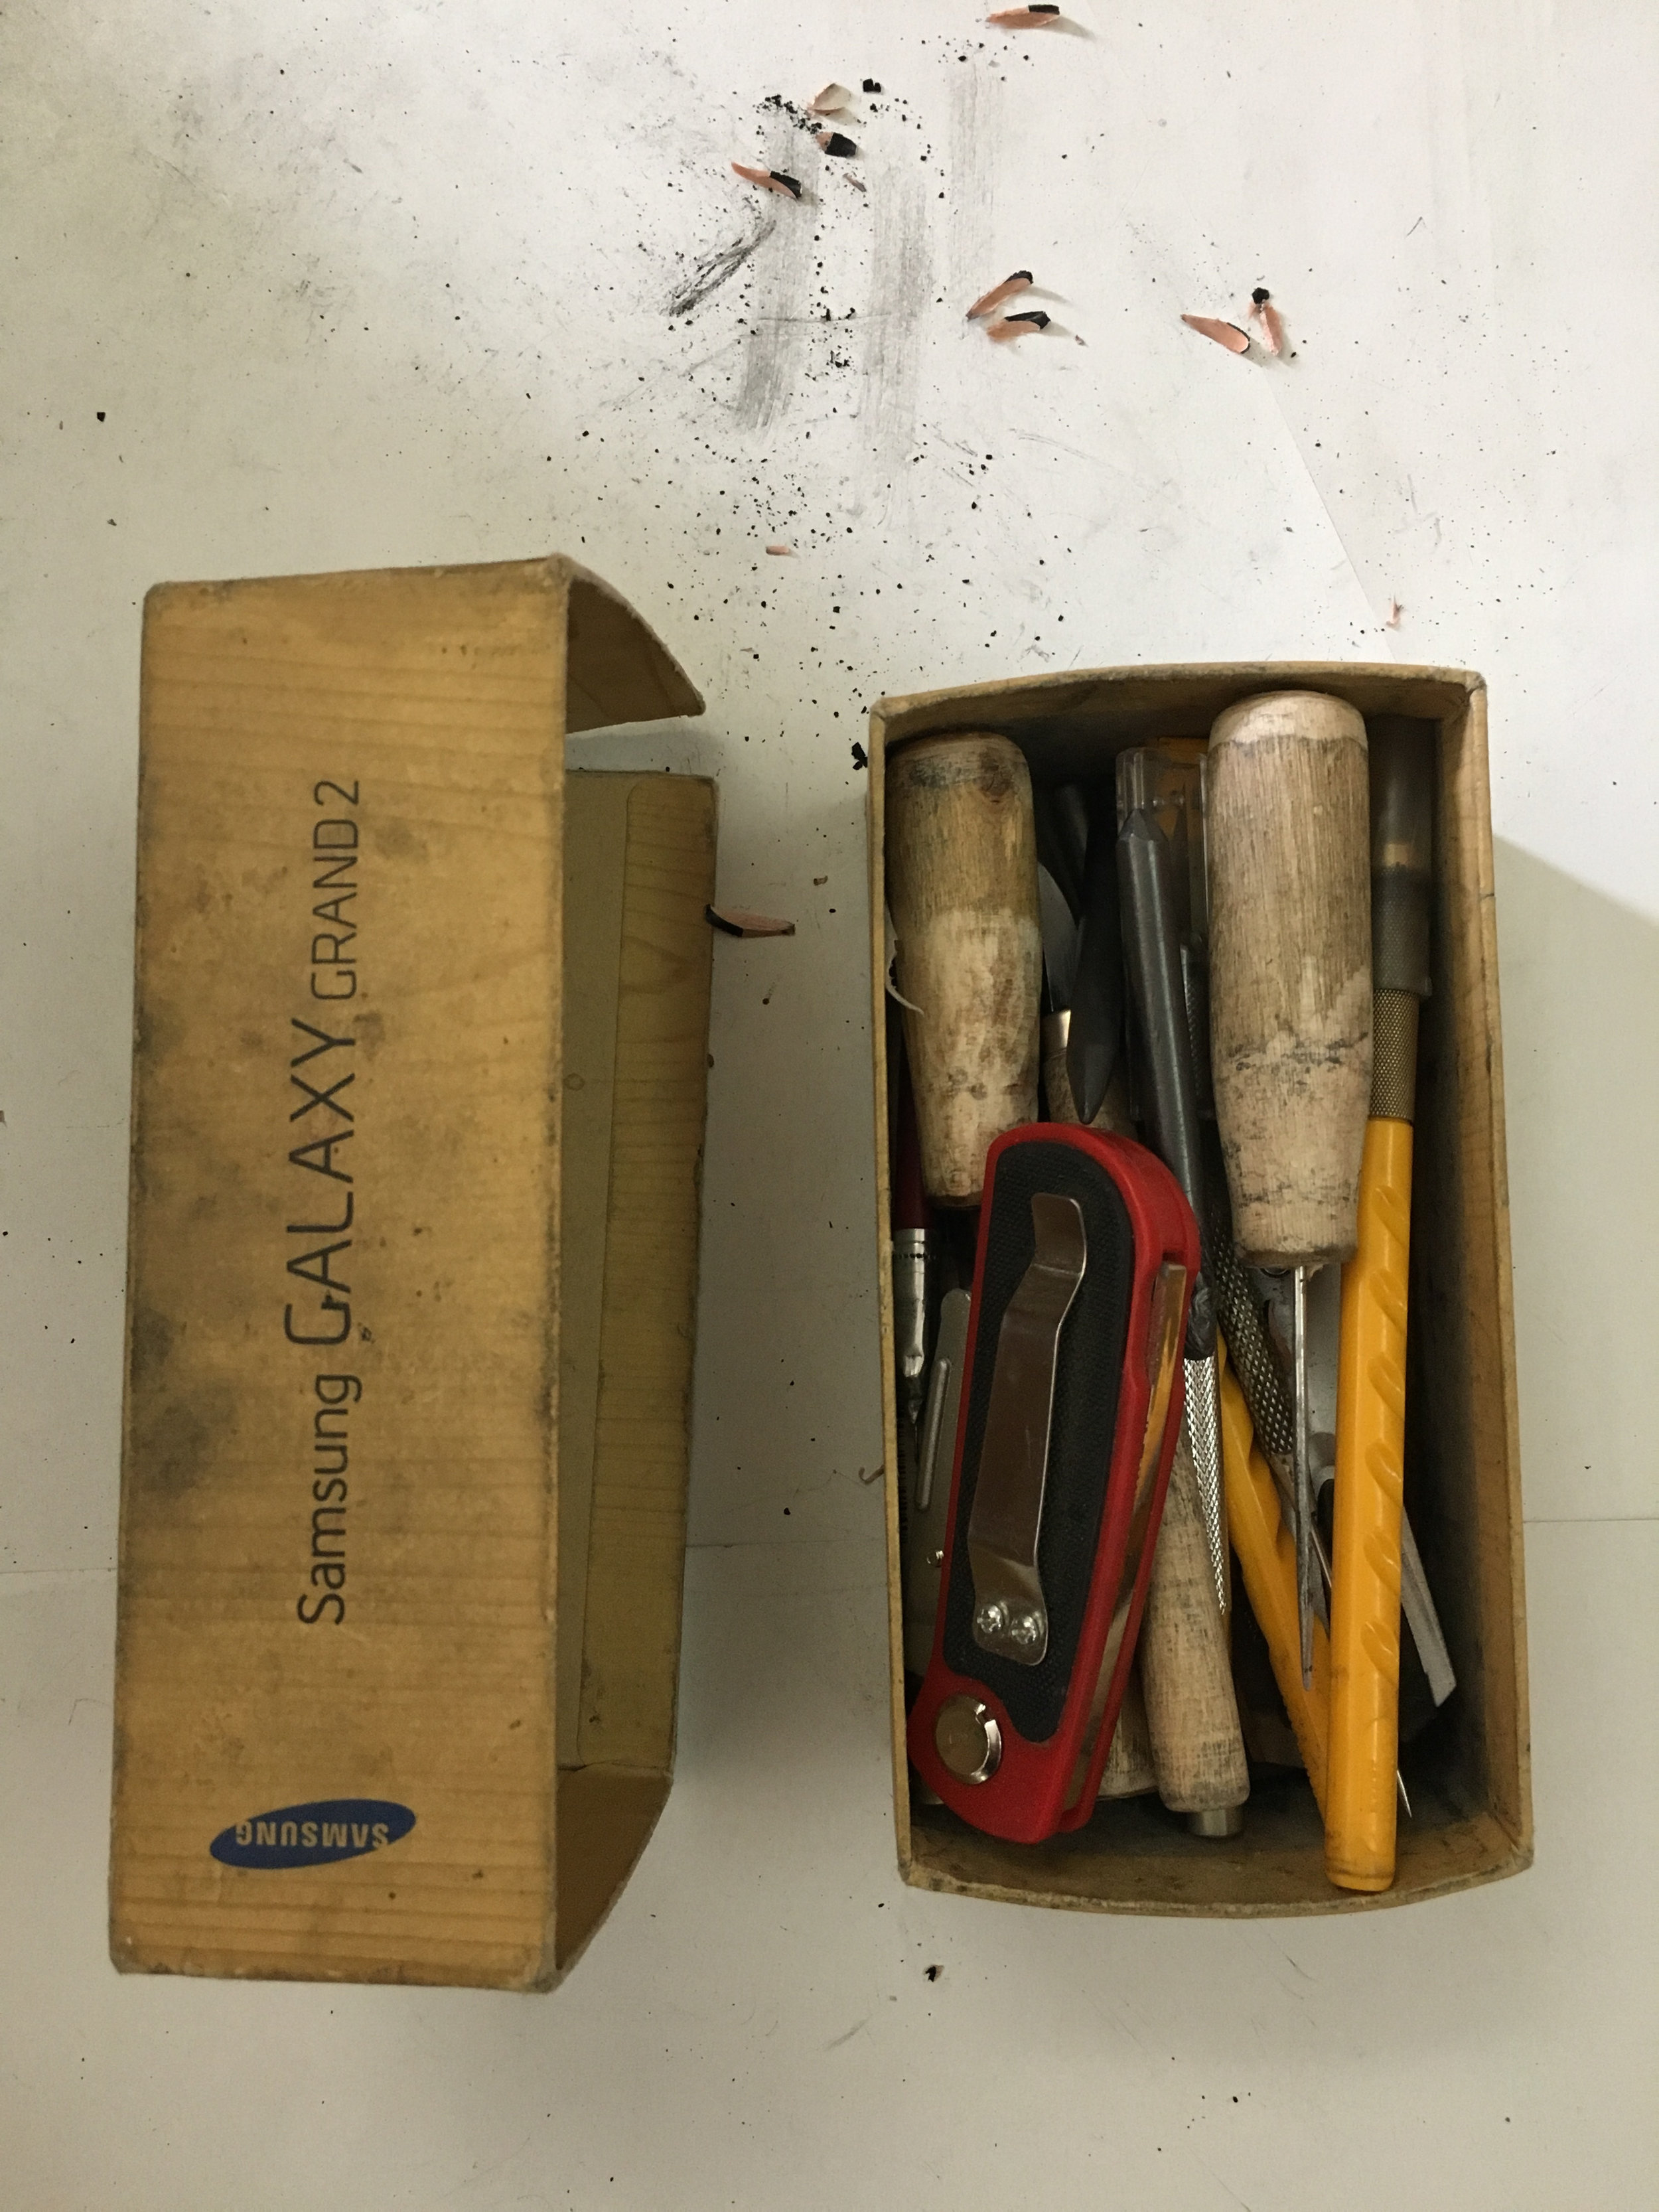 Tariq's tools